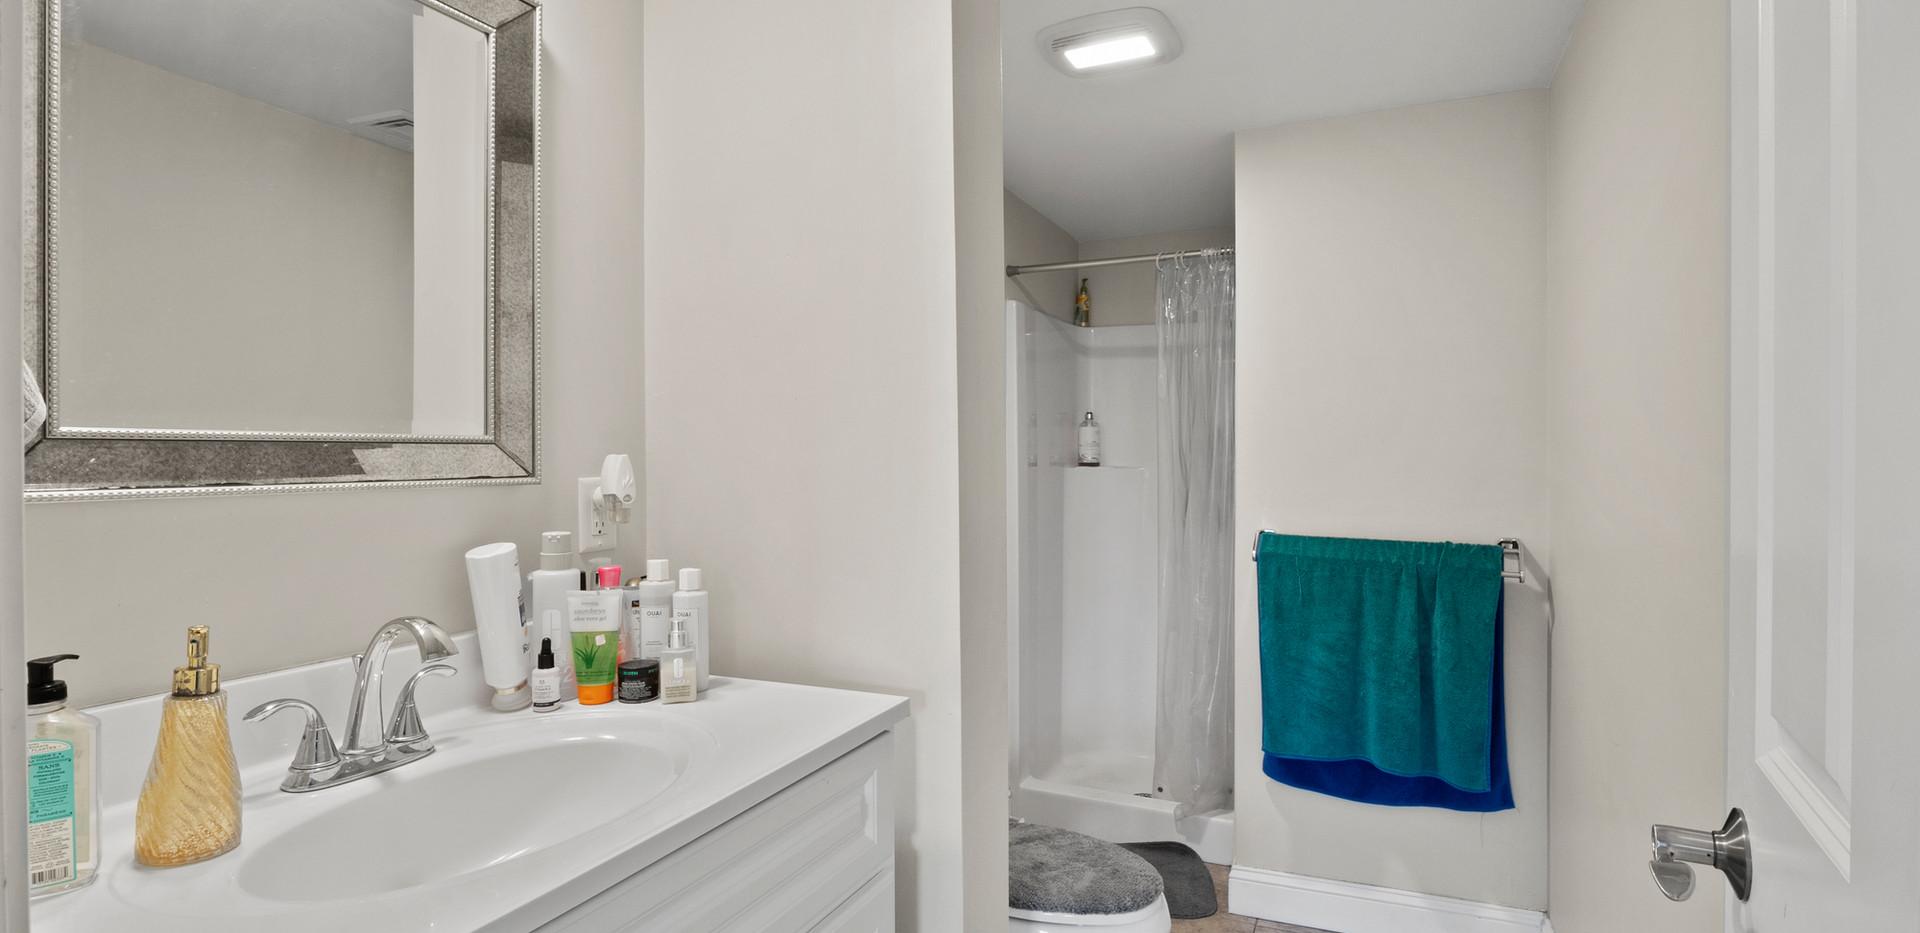 Prospect_2_Bathroom1.jpg